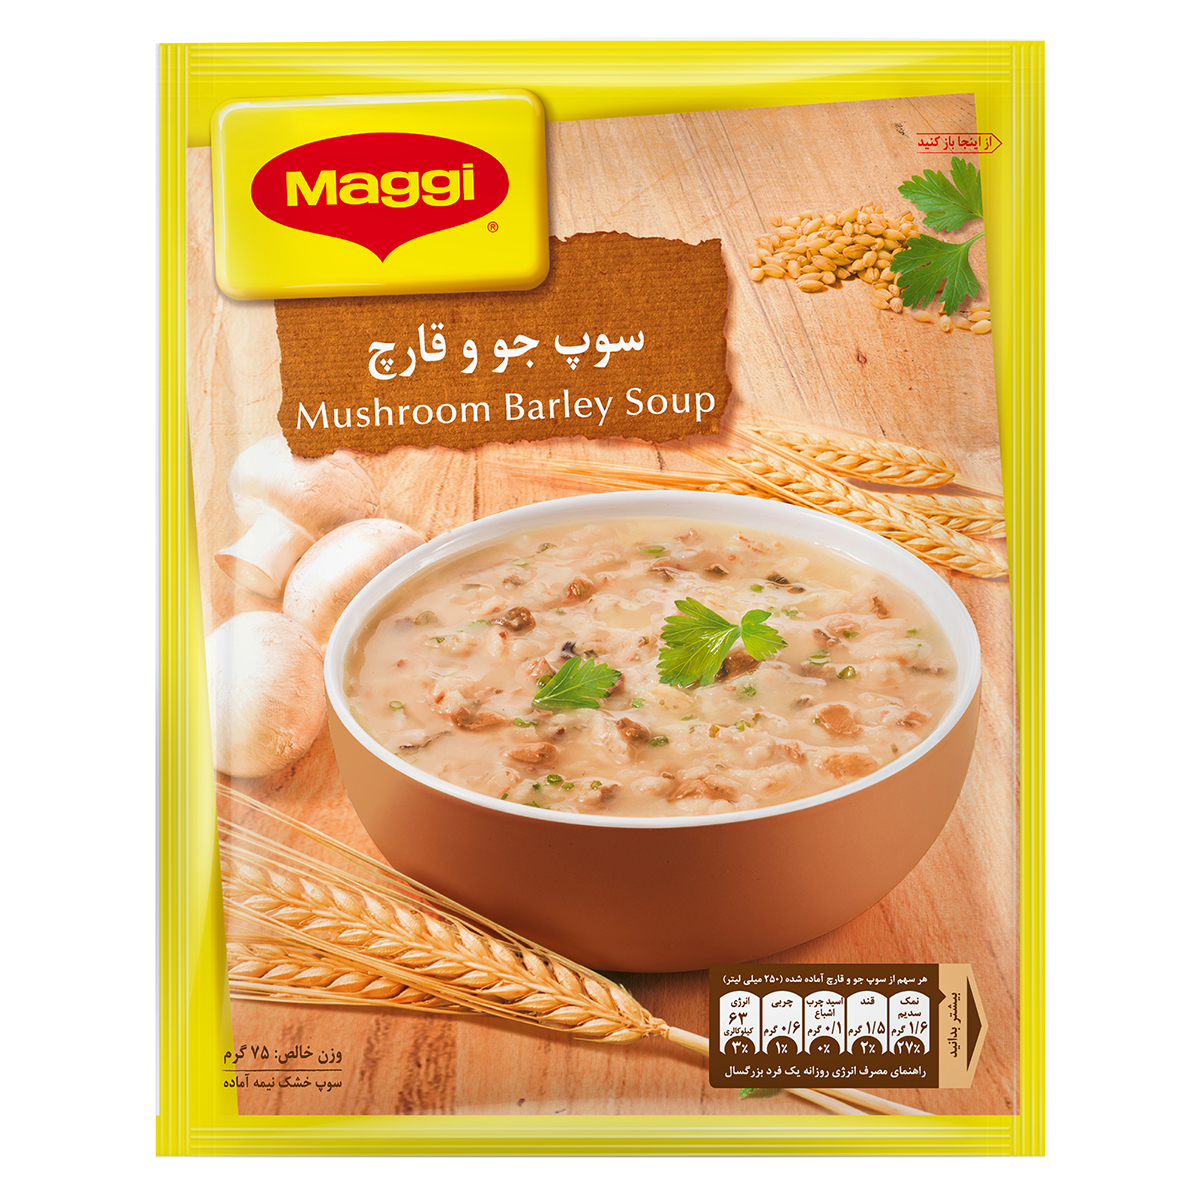 سوپ جو و قارچ مگی - 75 گرم